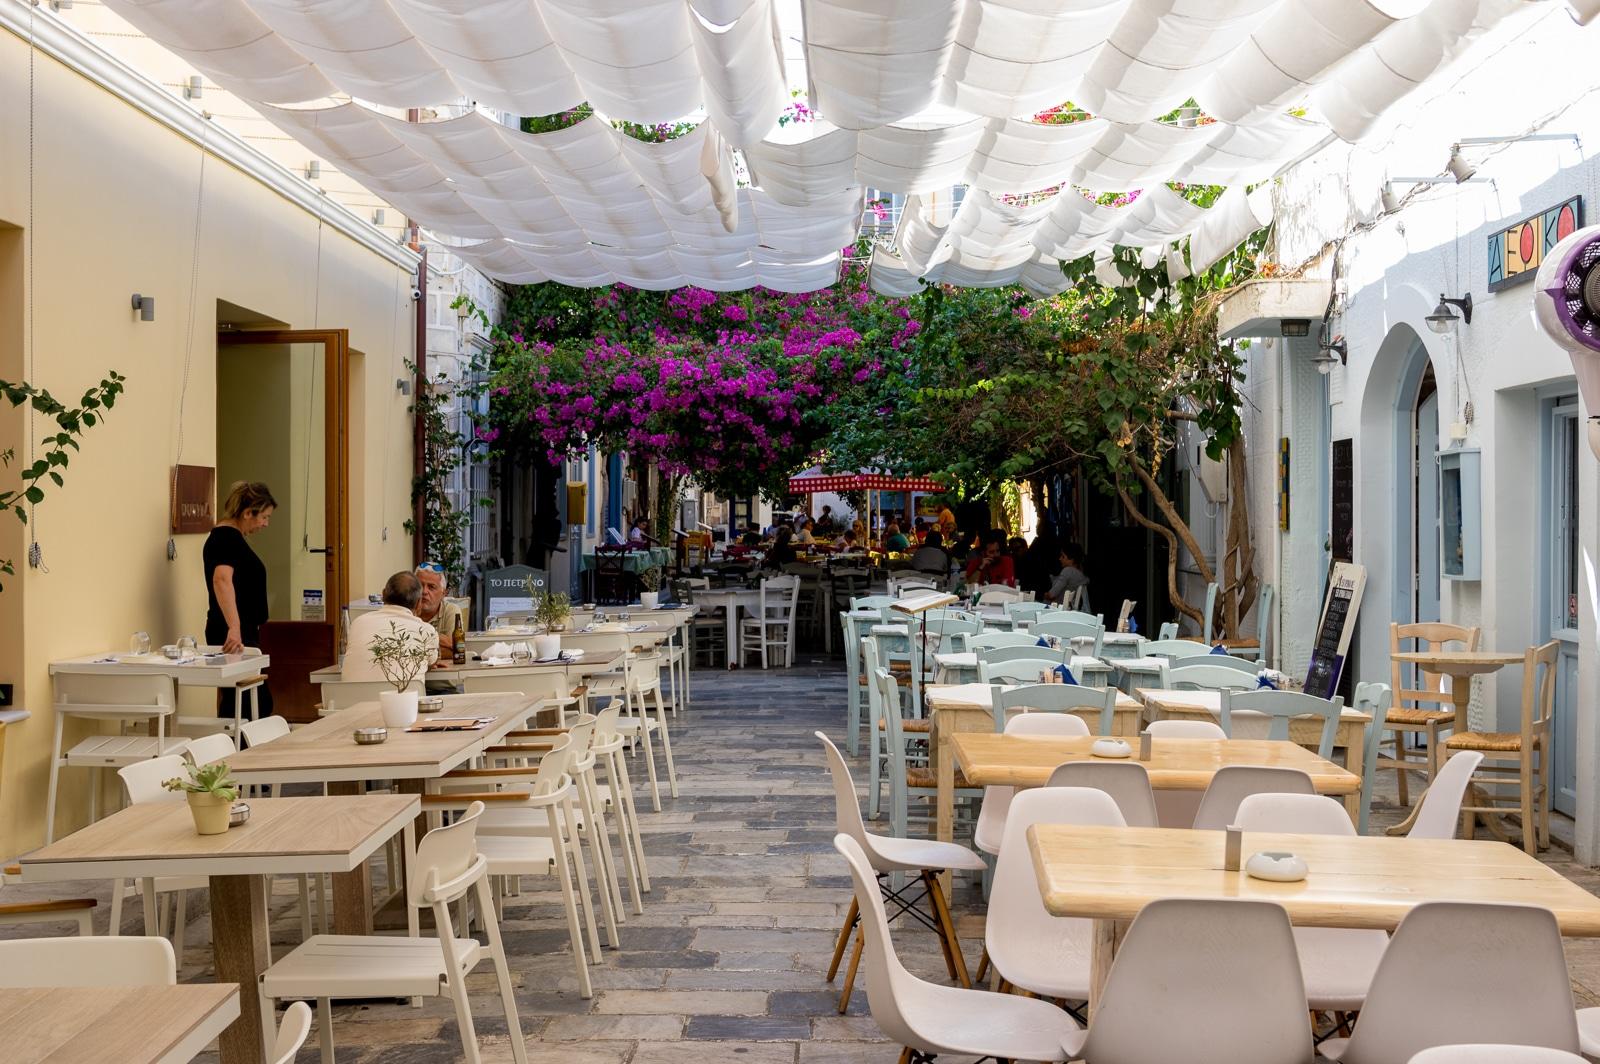 Syros : A Greek Island with Roman Influence Restaurants